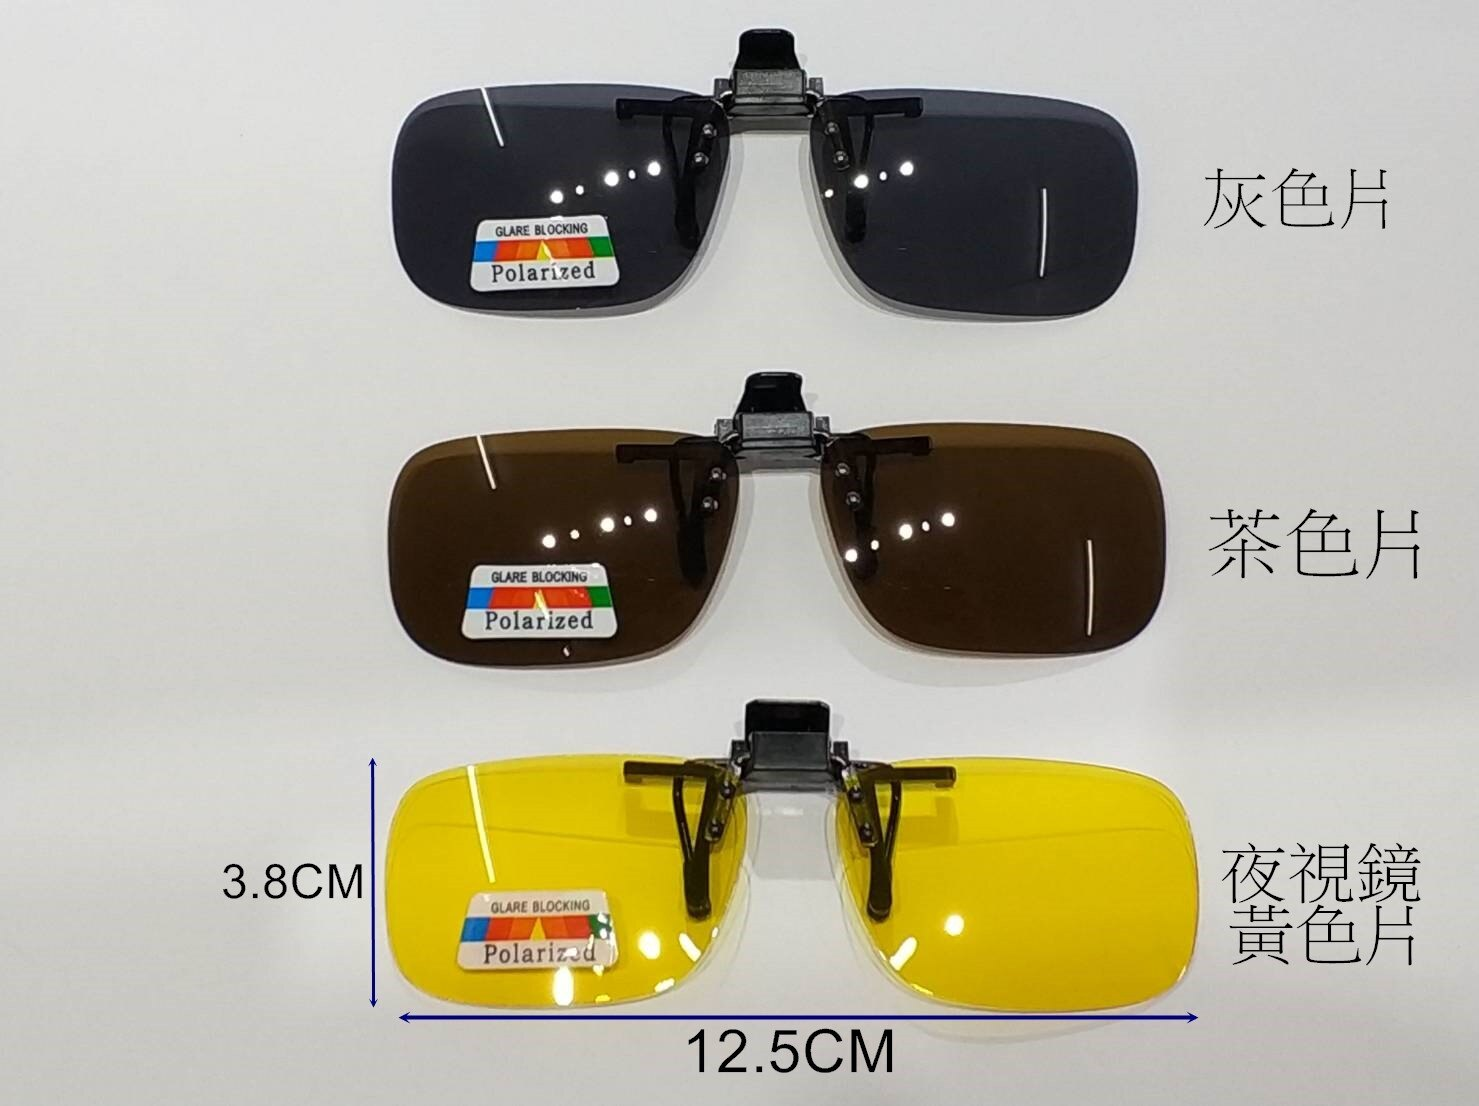 Polarized寶利徠偏光鏡片 護目鏡片鏡片可掀式 開車釣魚 專用鏡片 購買此商品眼鏡布可以加購價優惠只要1元